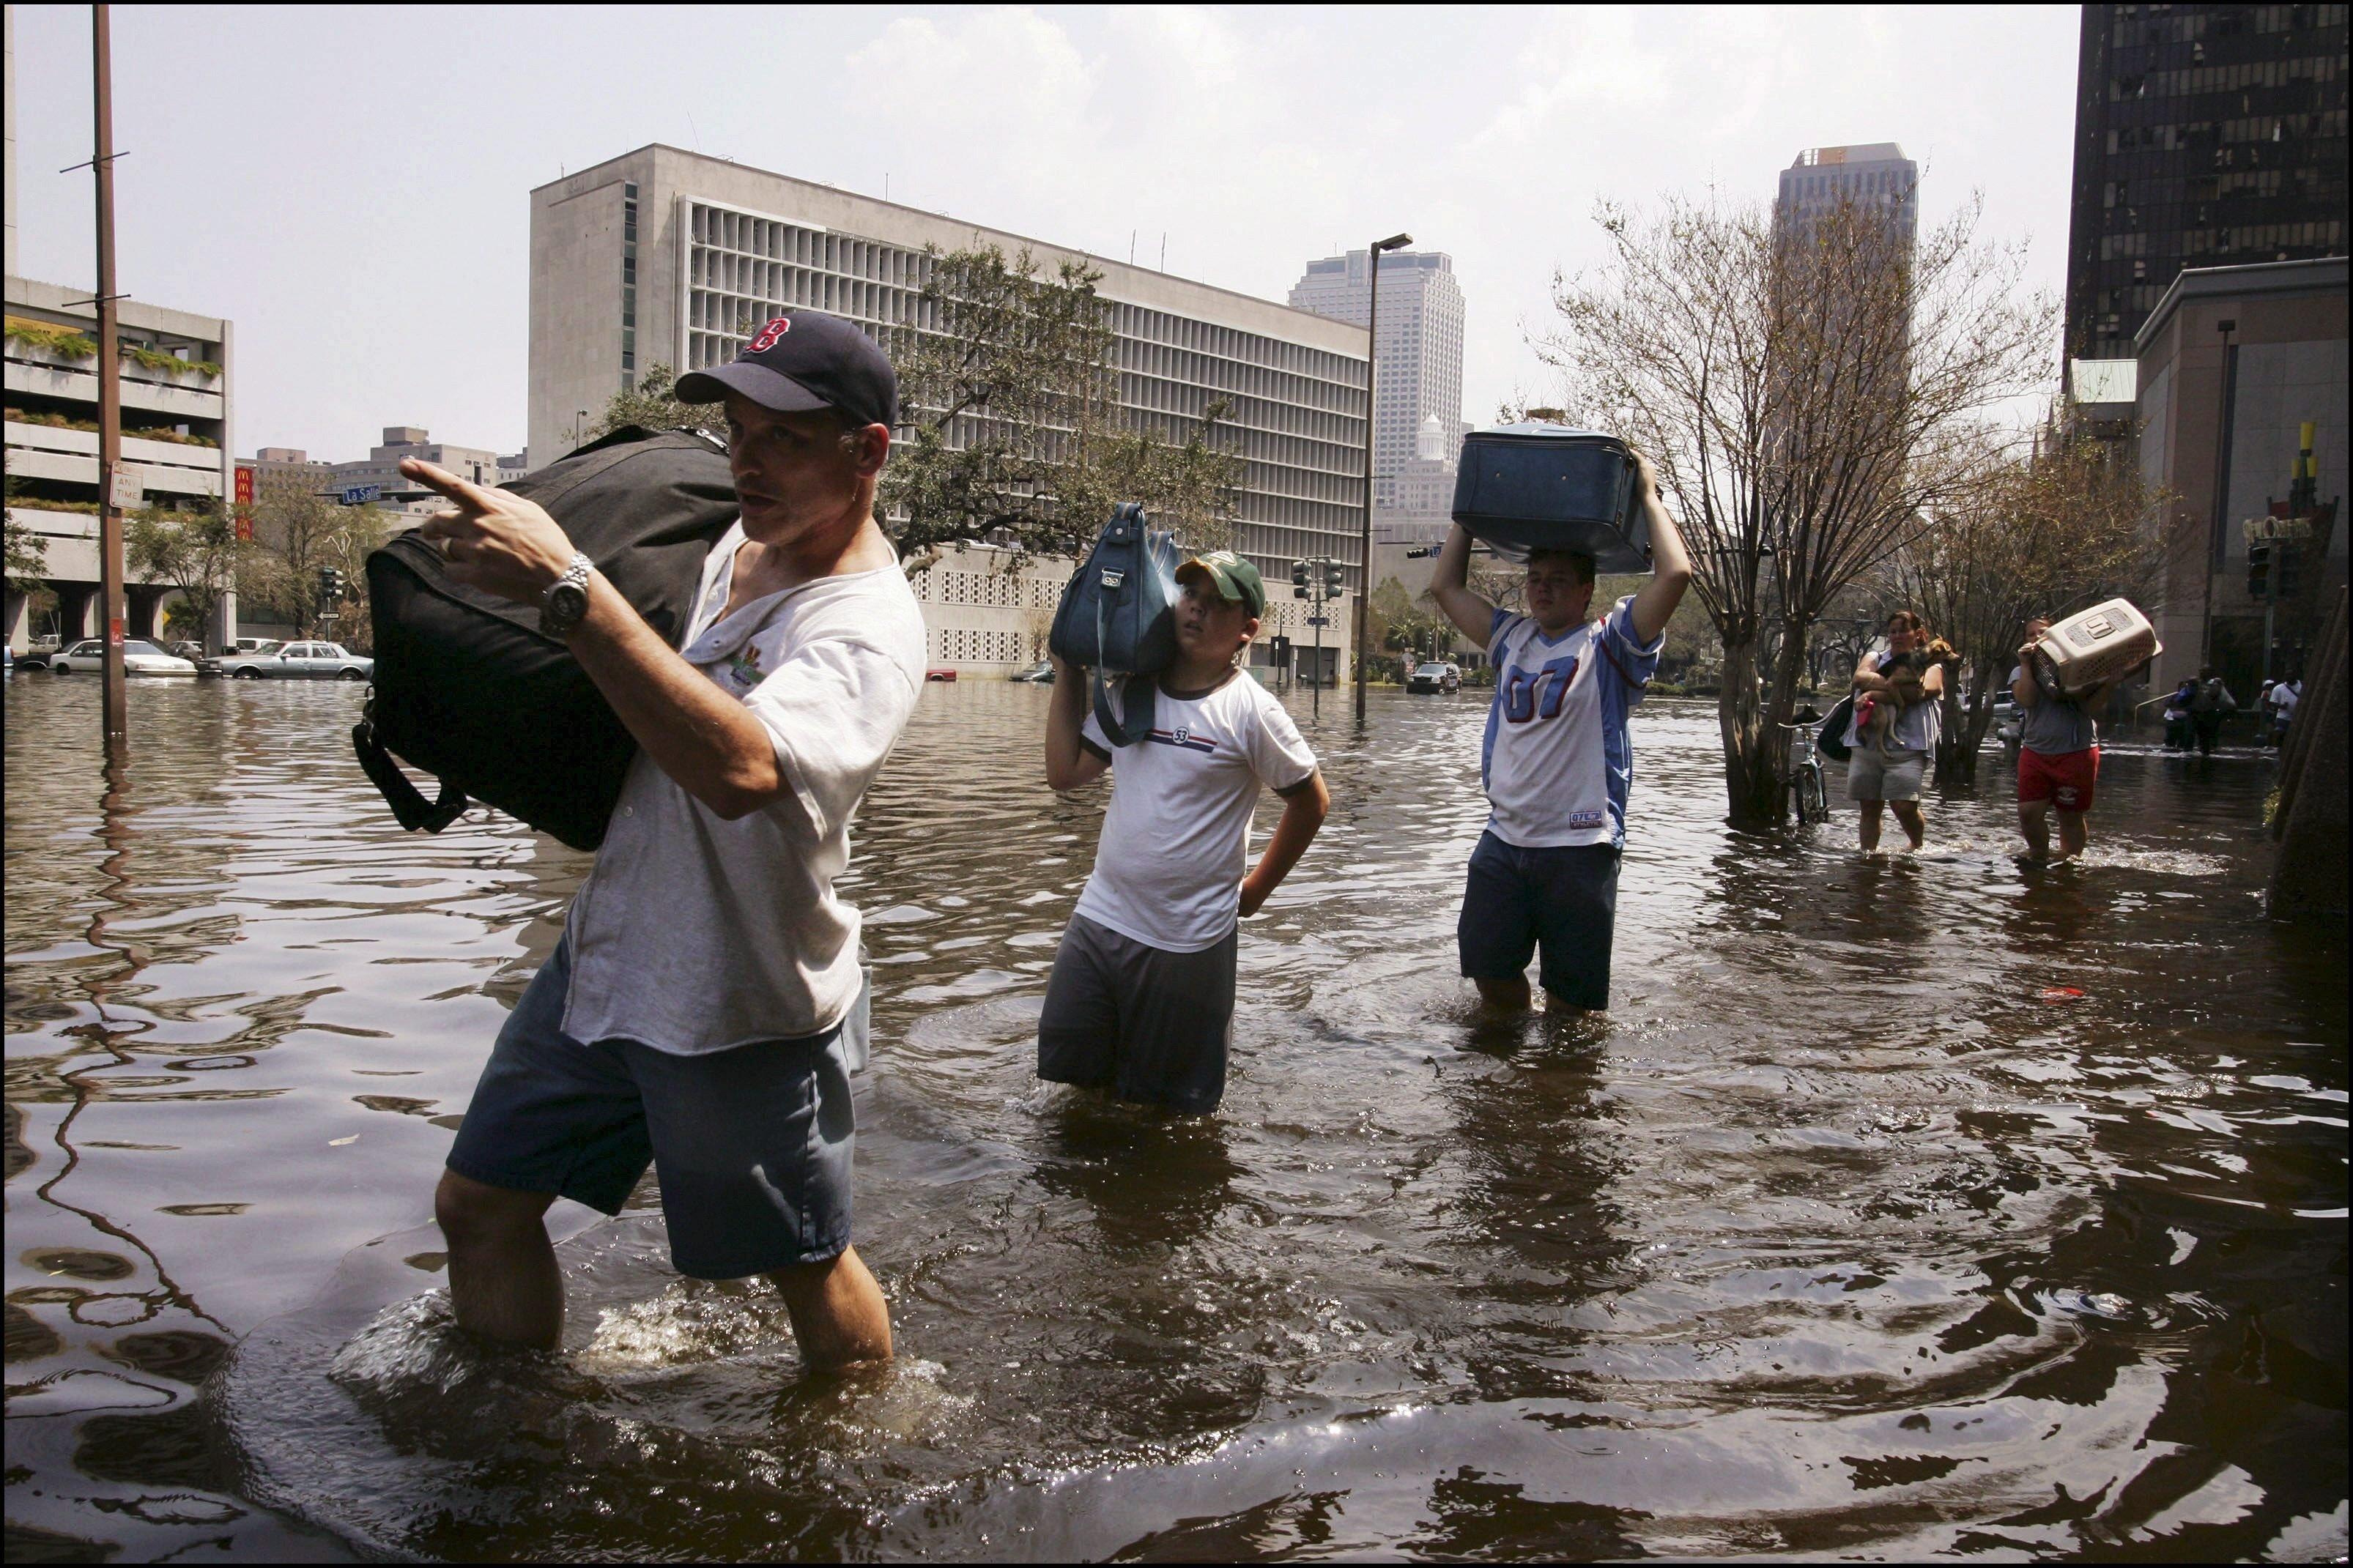 Survivors of Hurricane Katrina evacuate their homes on Sept. 3, 2005.